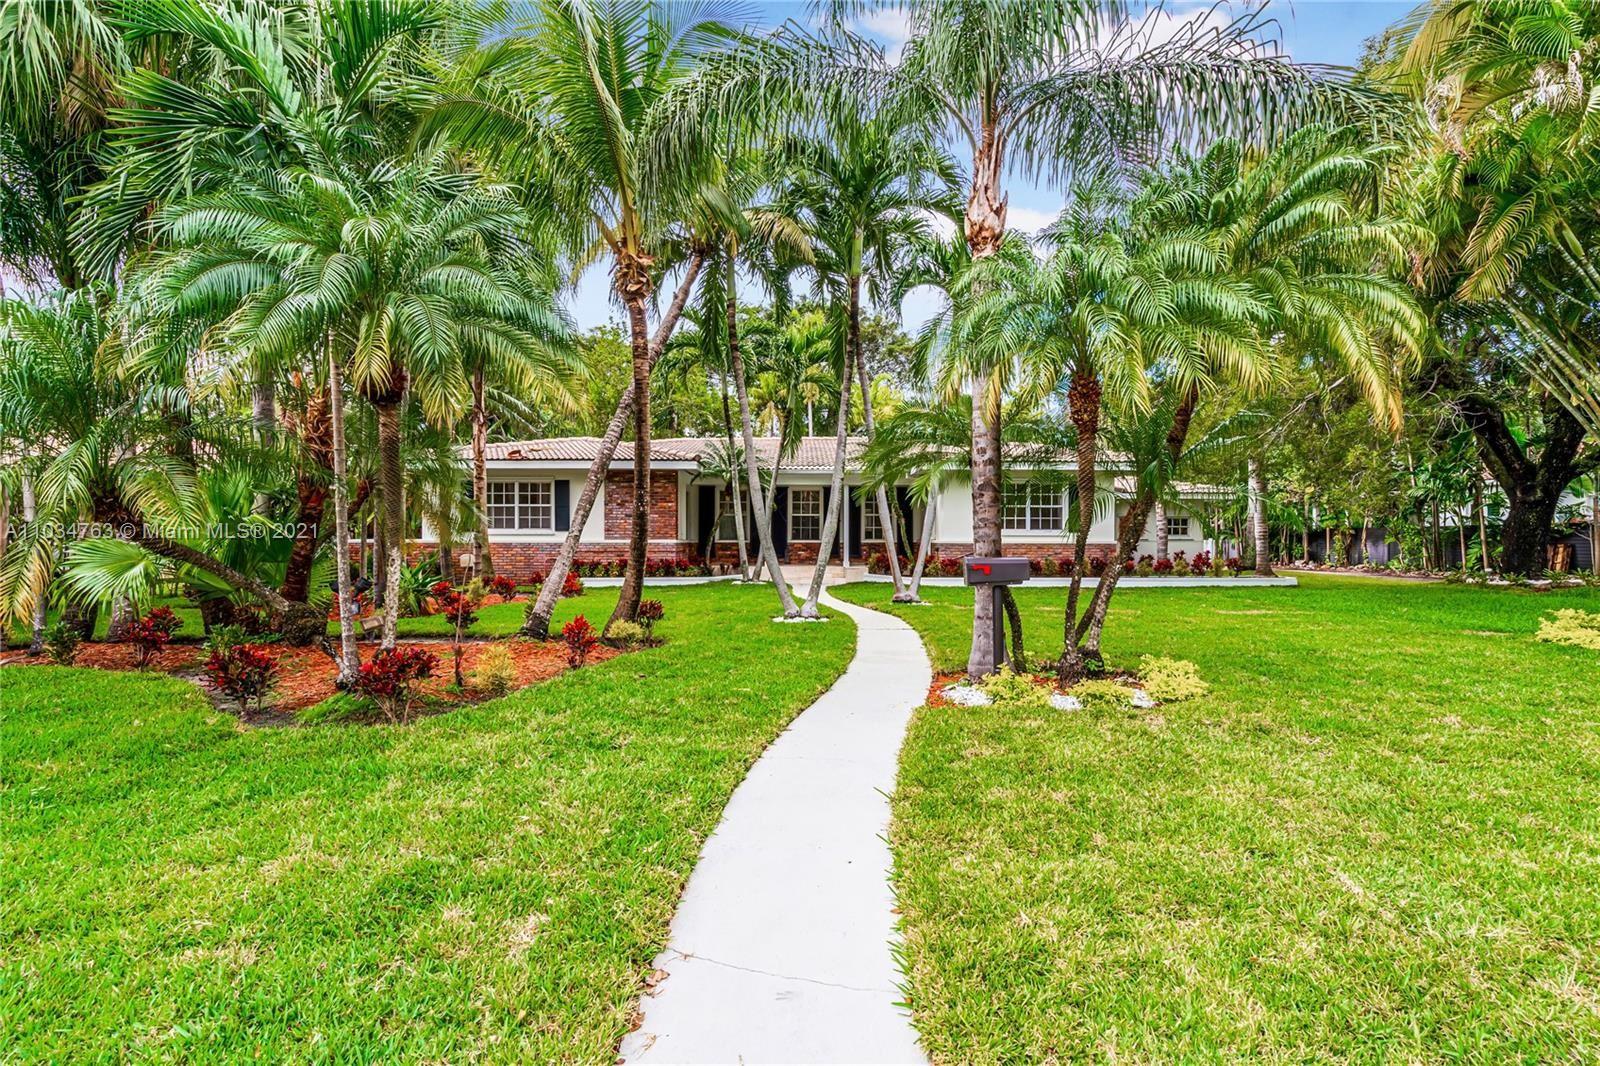 4756 Bay Point Rd, Miami, FL 33137 - #: A11034763